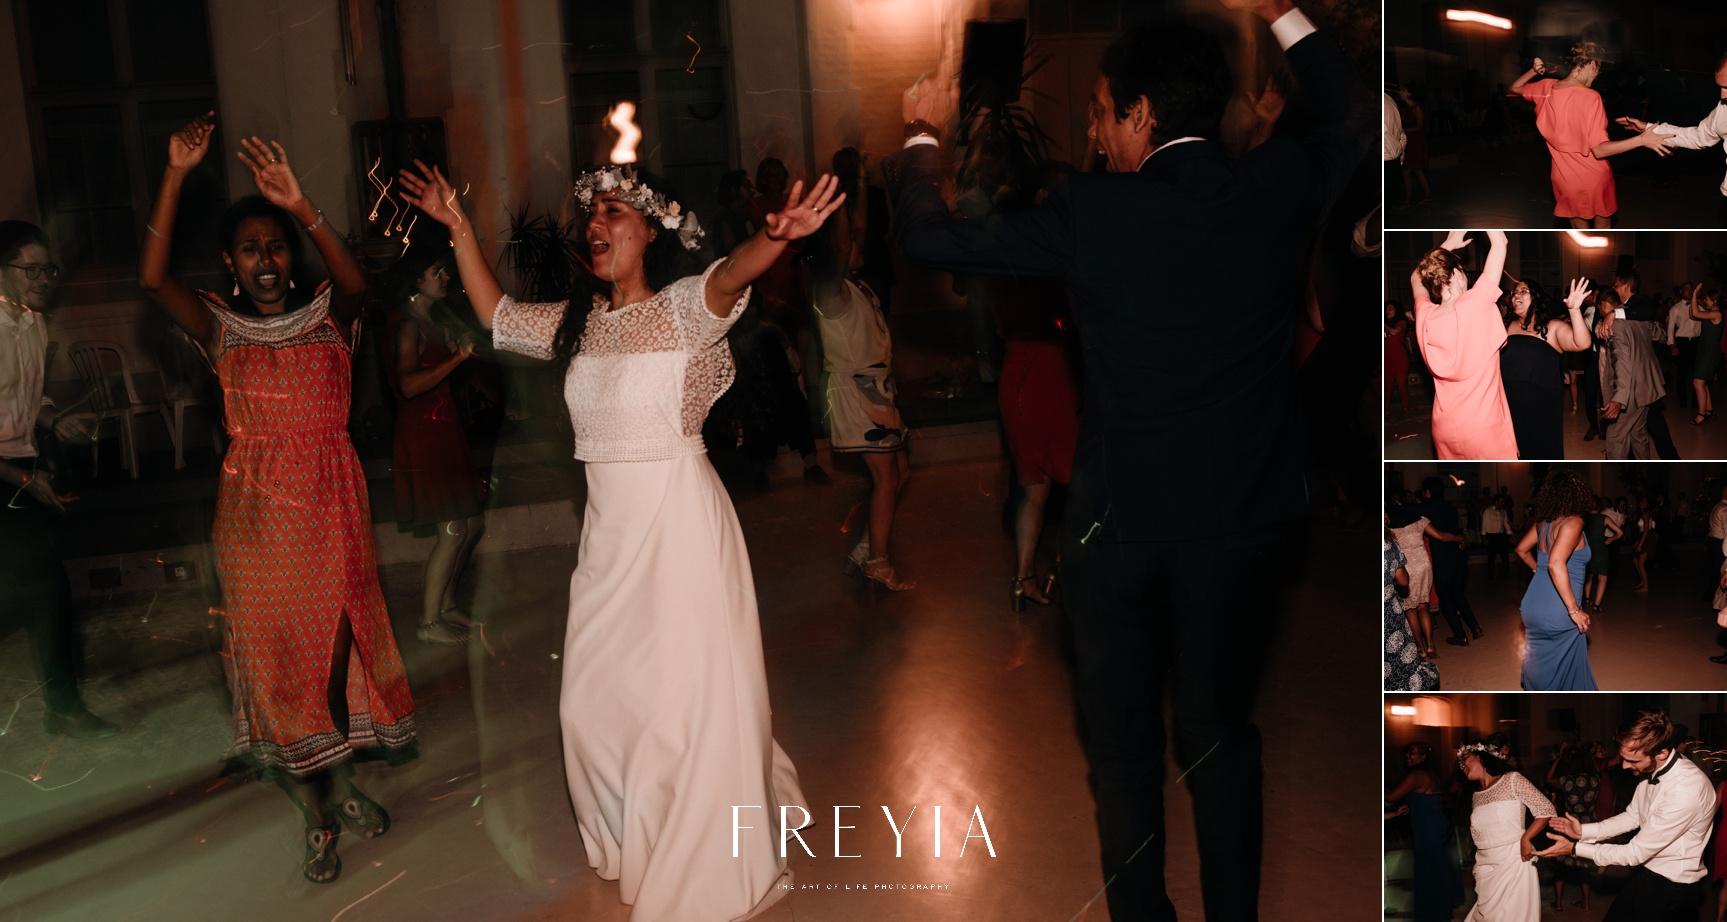 R + T |  mariage reportage alternatif moody intime minimaliste vintage naturel boho boheme |  PHOTOGRAPHE mariage PARIS france destination  | FREYIA photography_-386.jpg